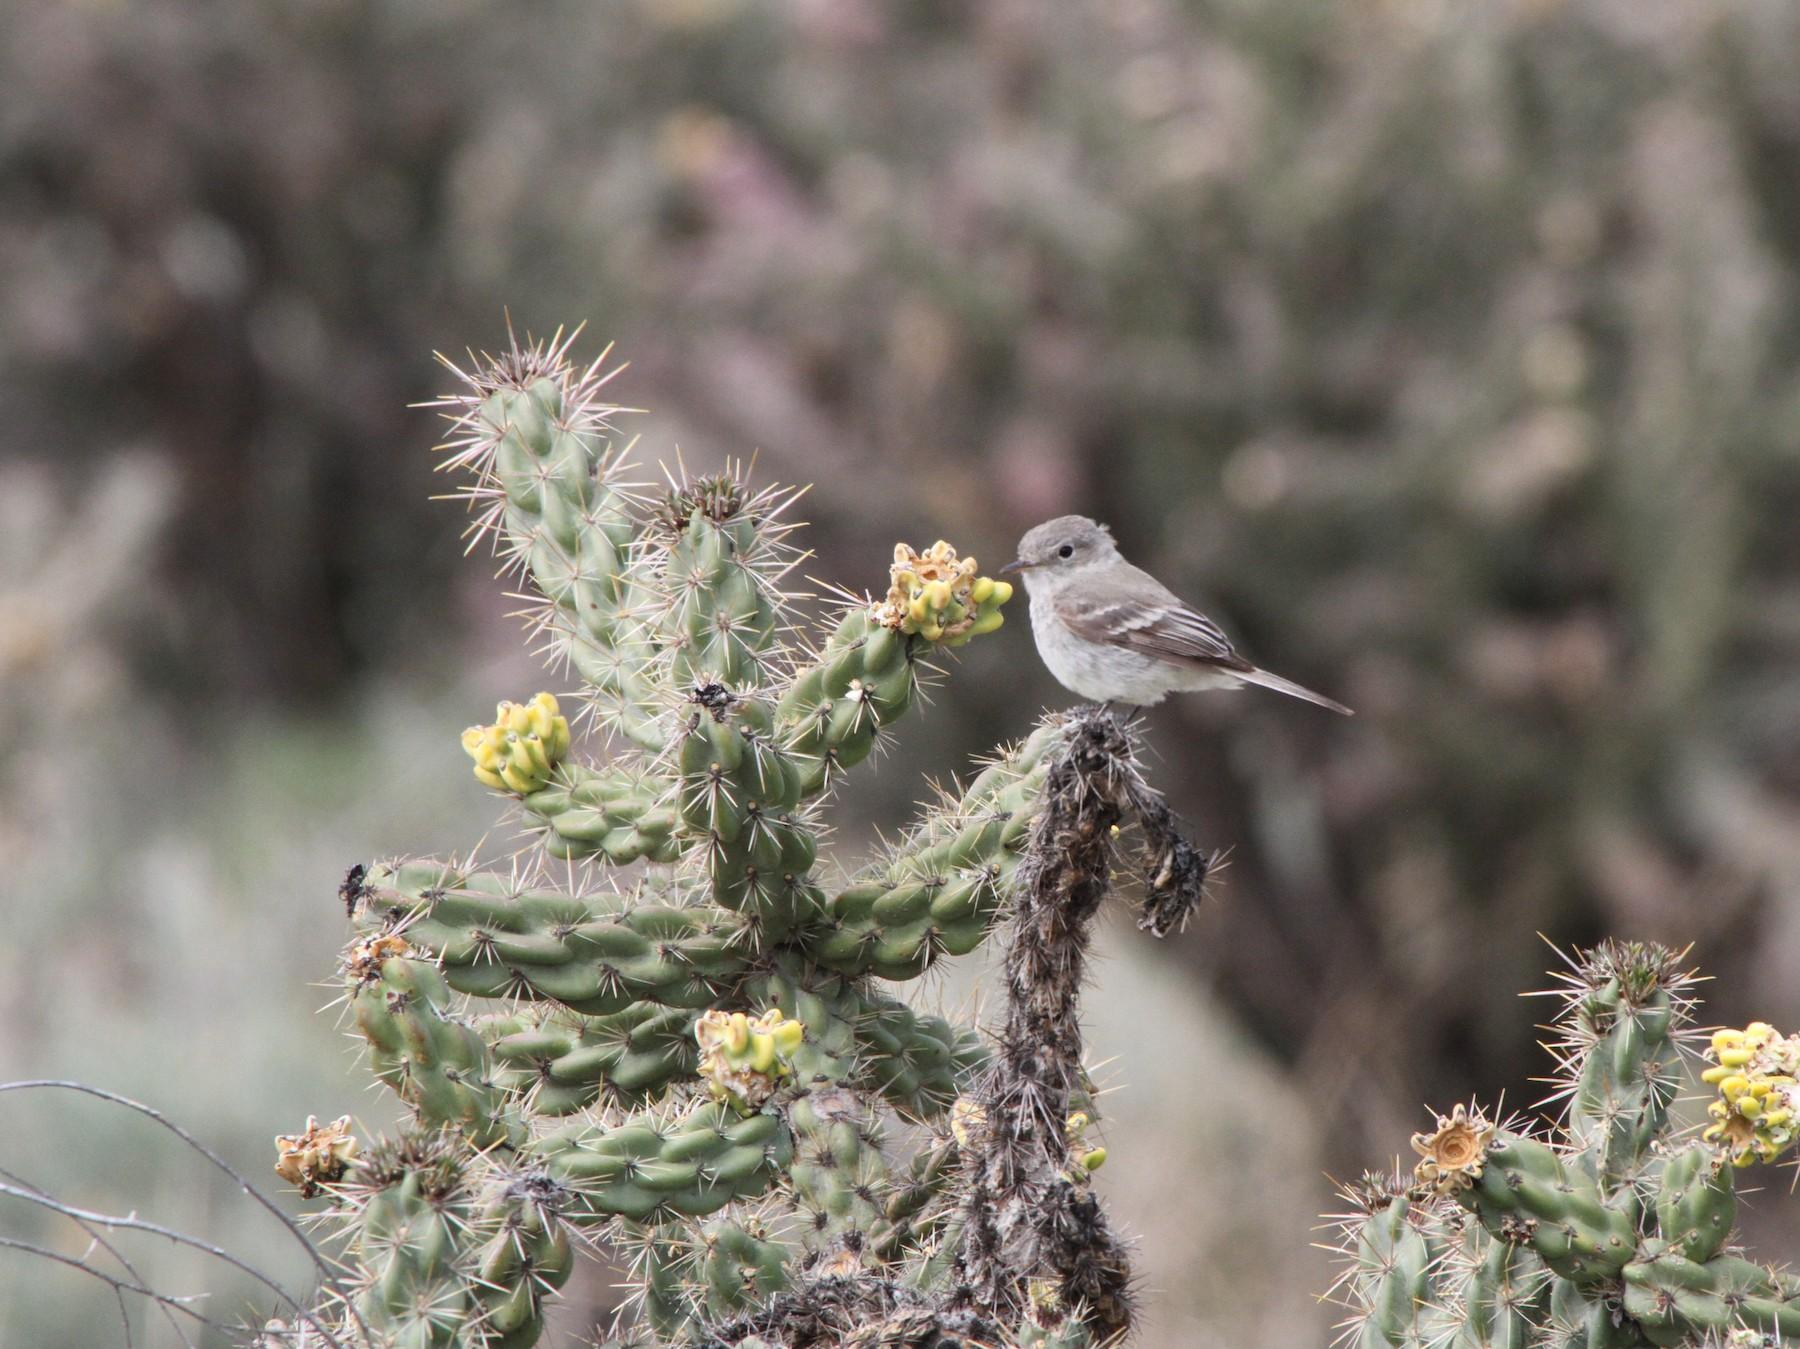 Gray Flycatcher - Caleb Hawley